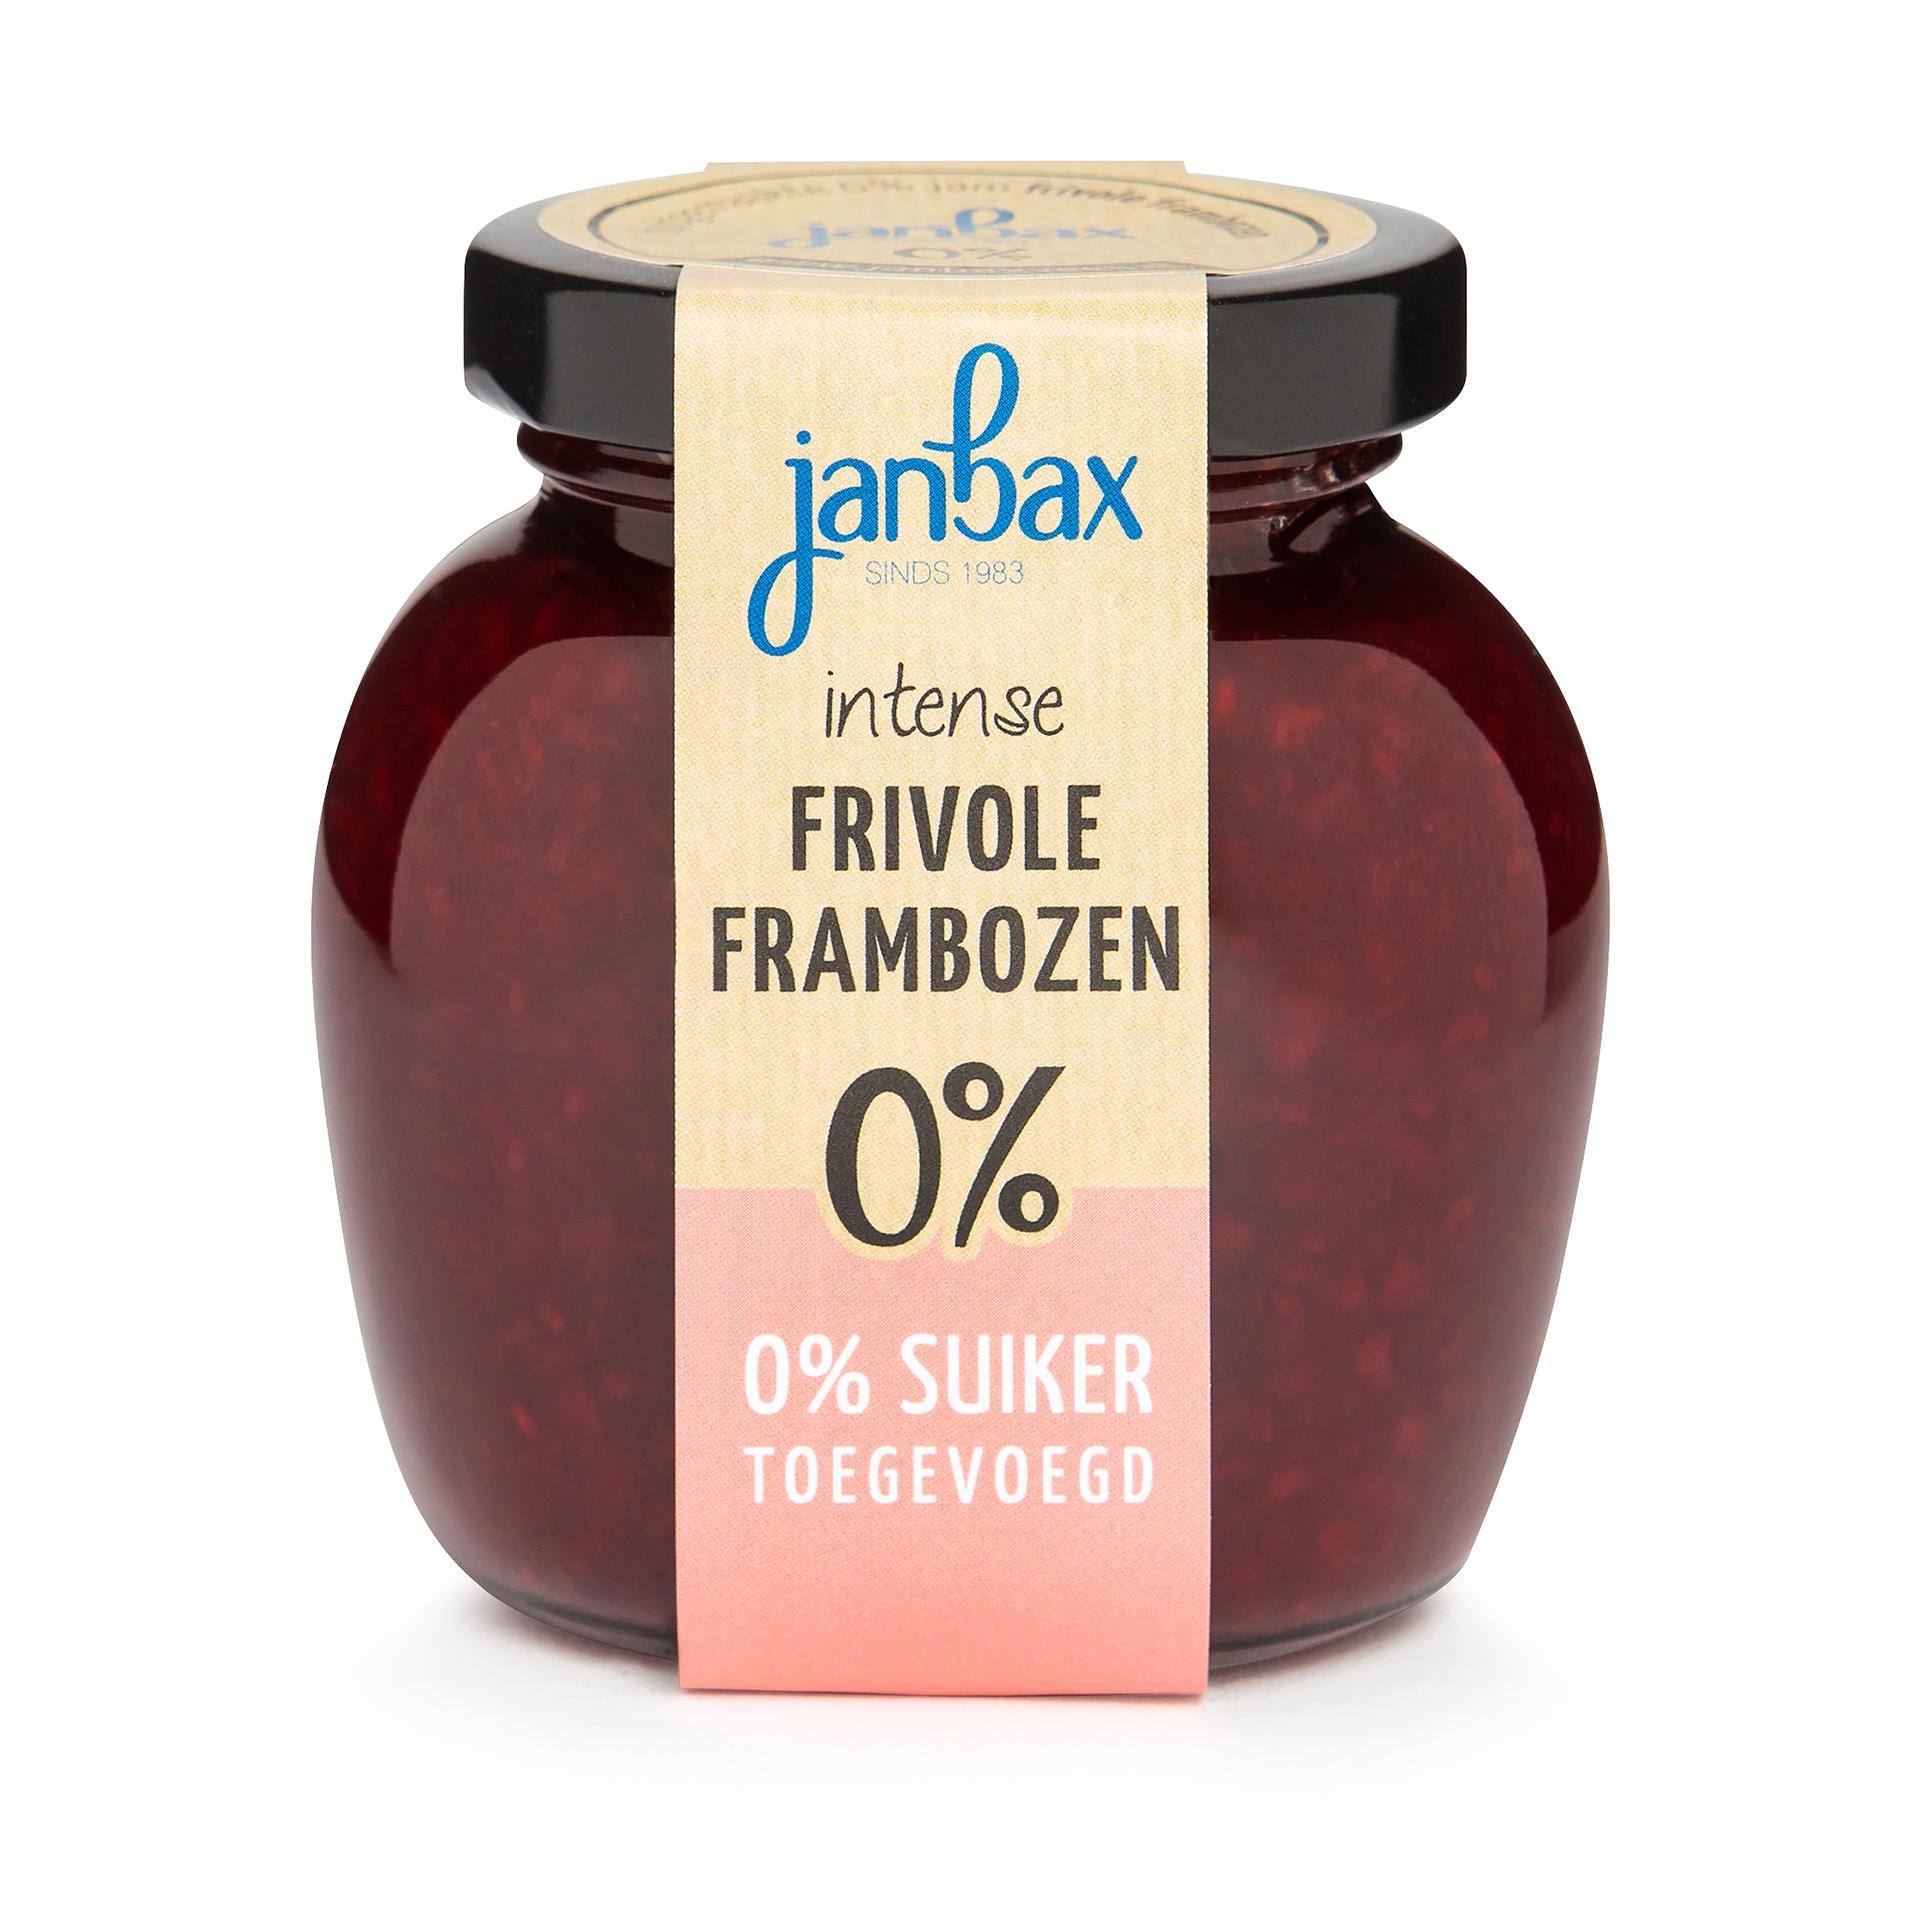 Intense 0% jam frambozen zonder toegevoegd suiker